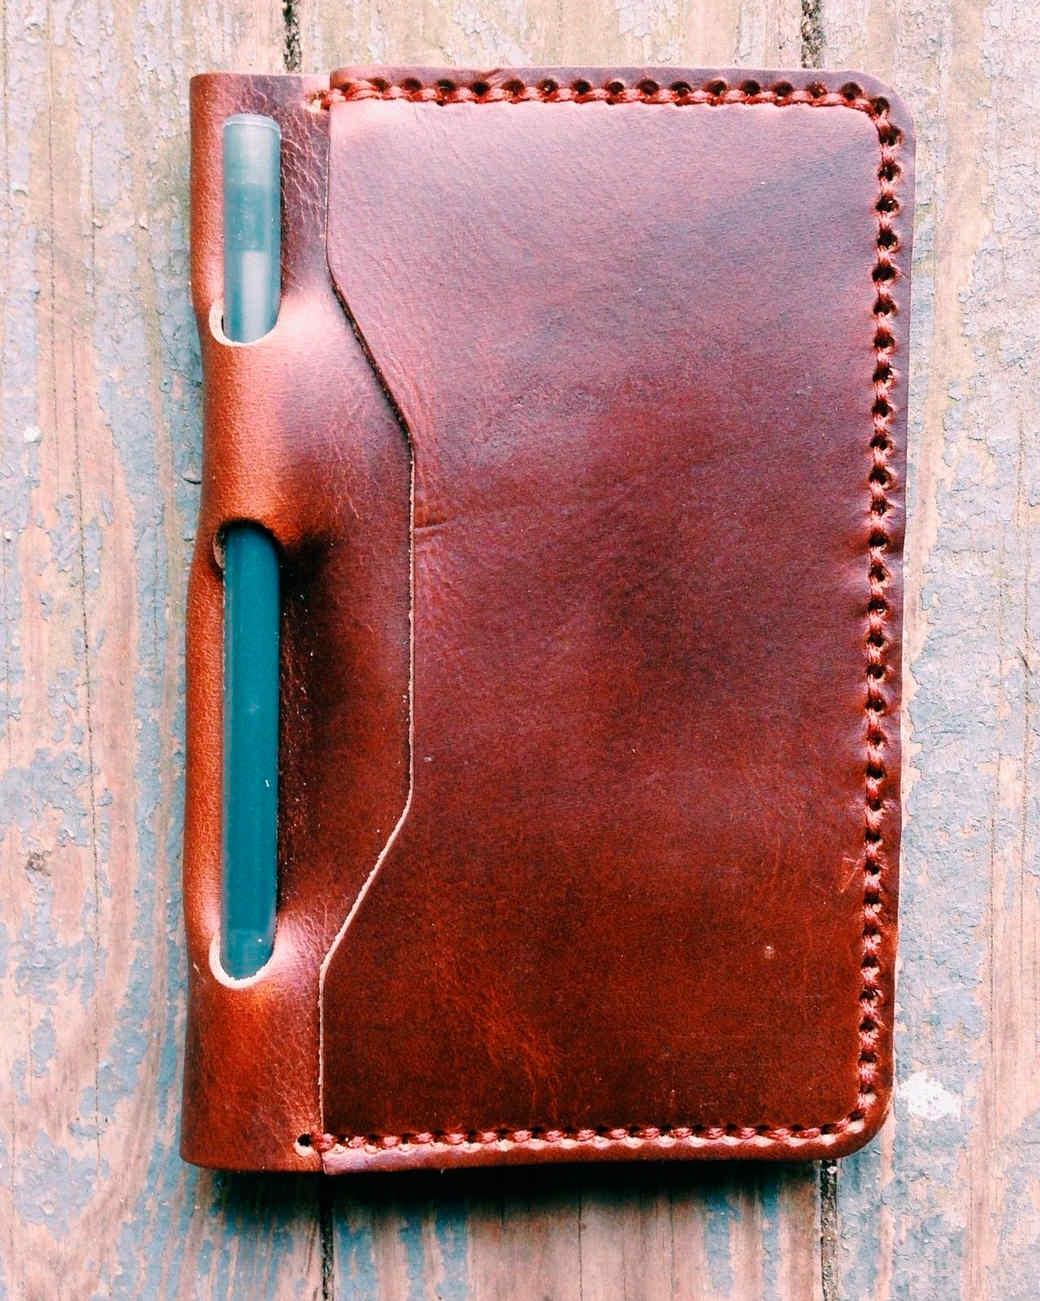 loyal-stricklin-wallet-passport-cover-0714.jpg